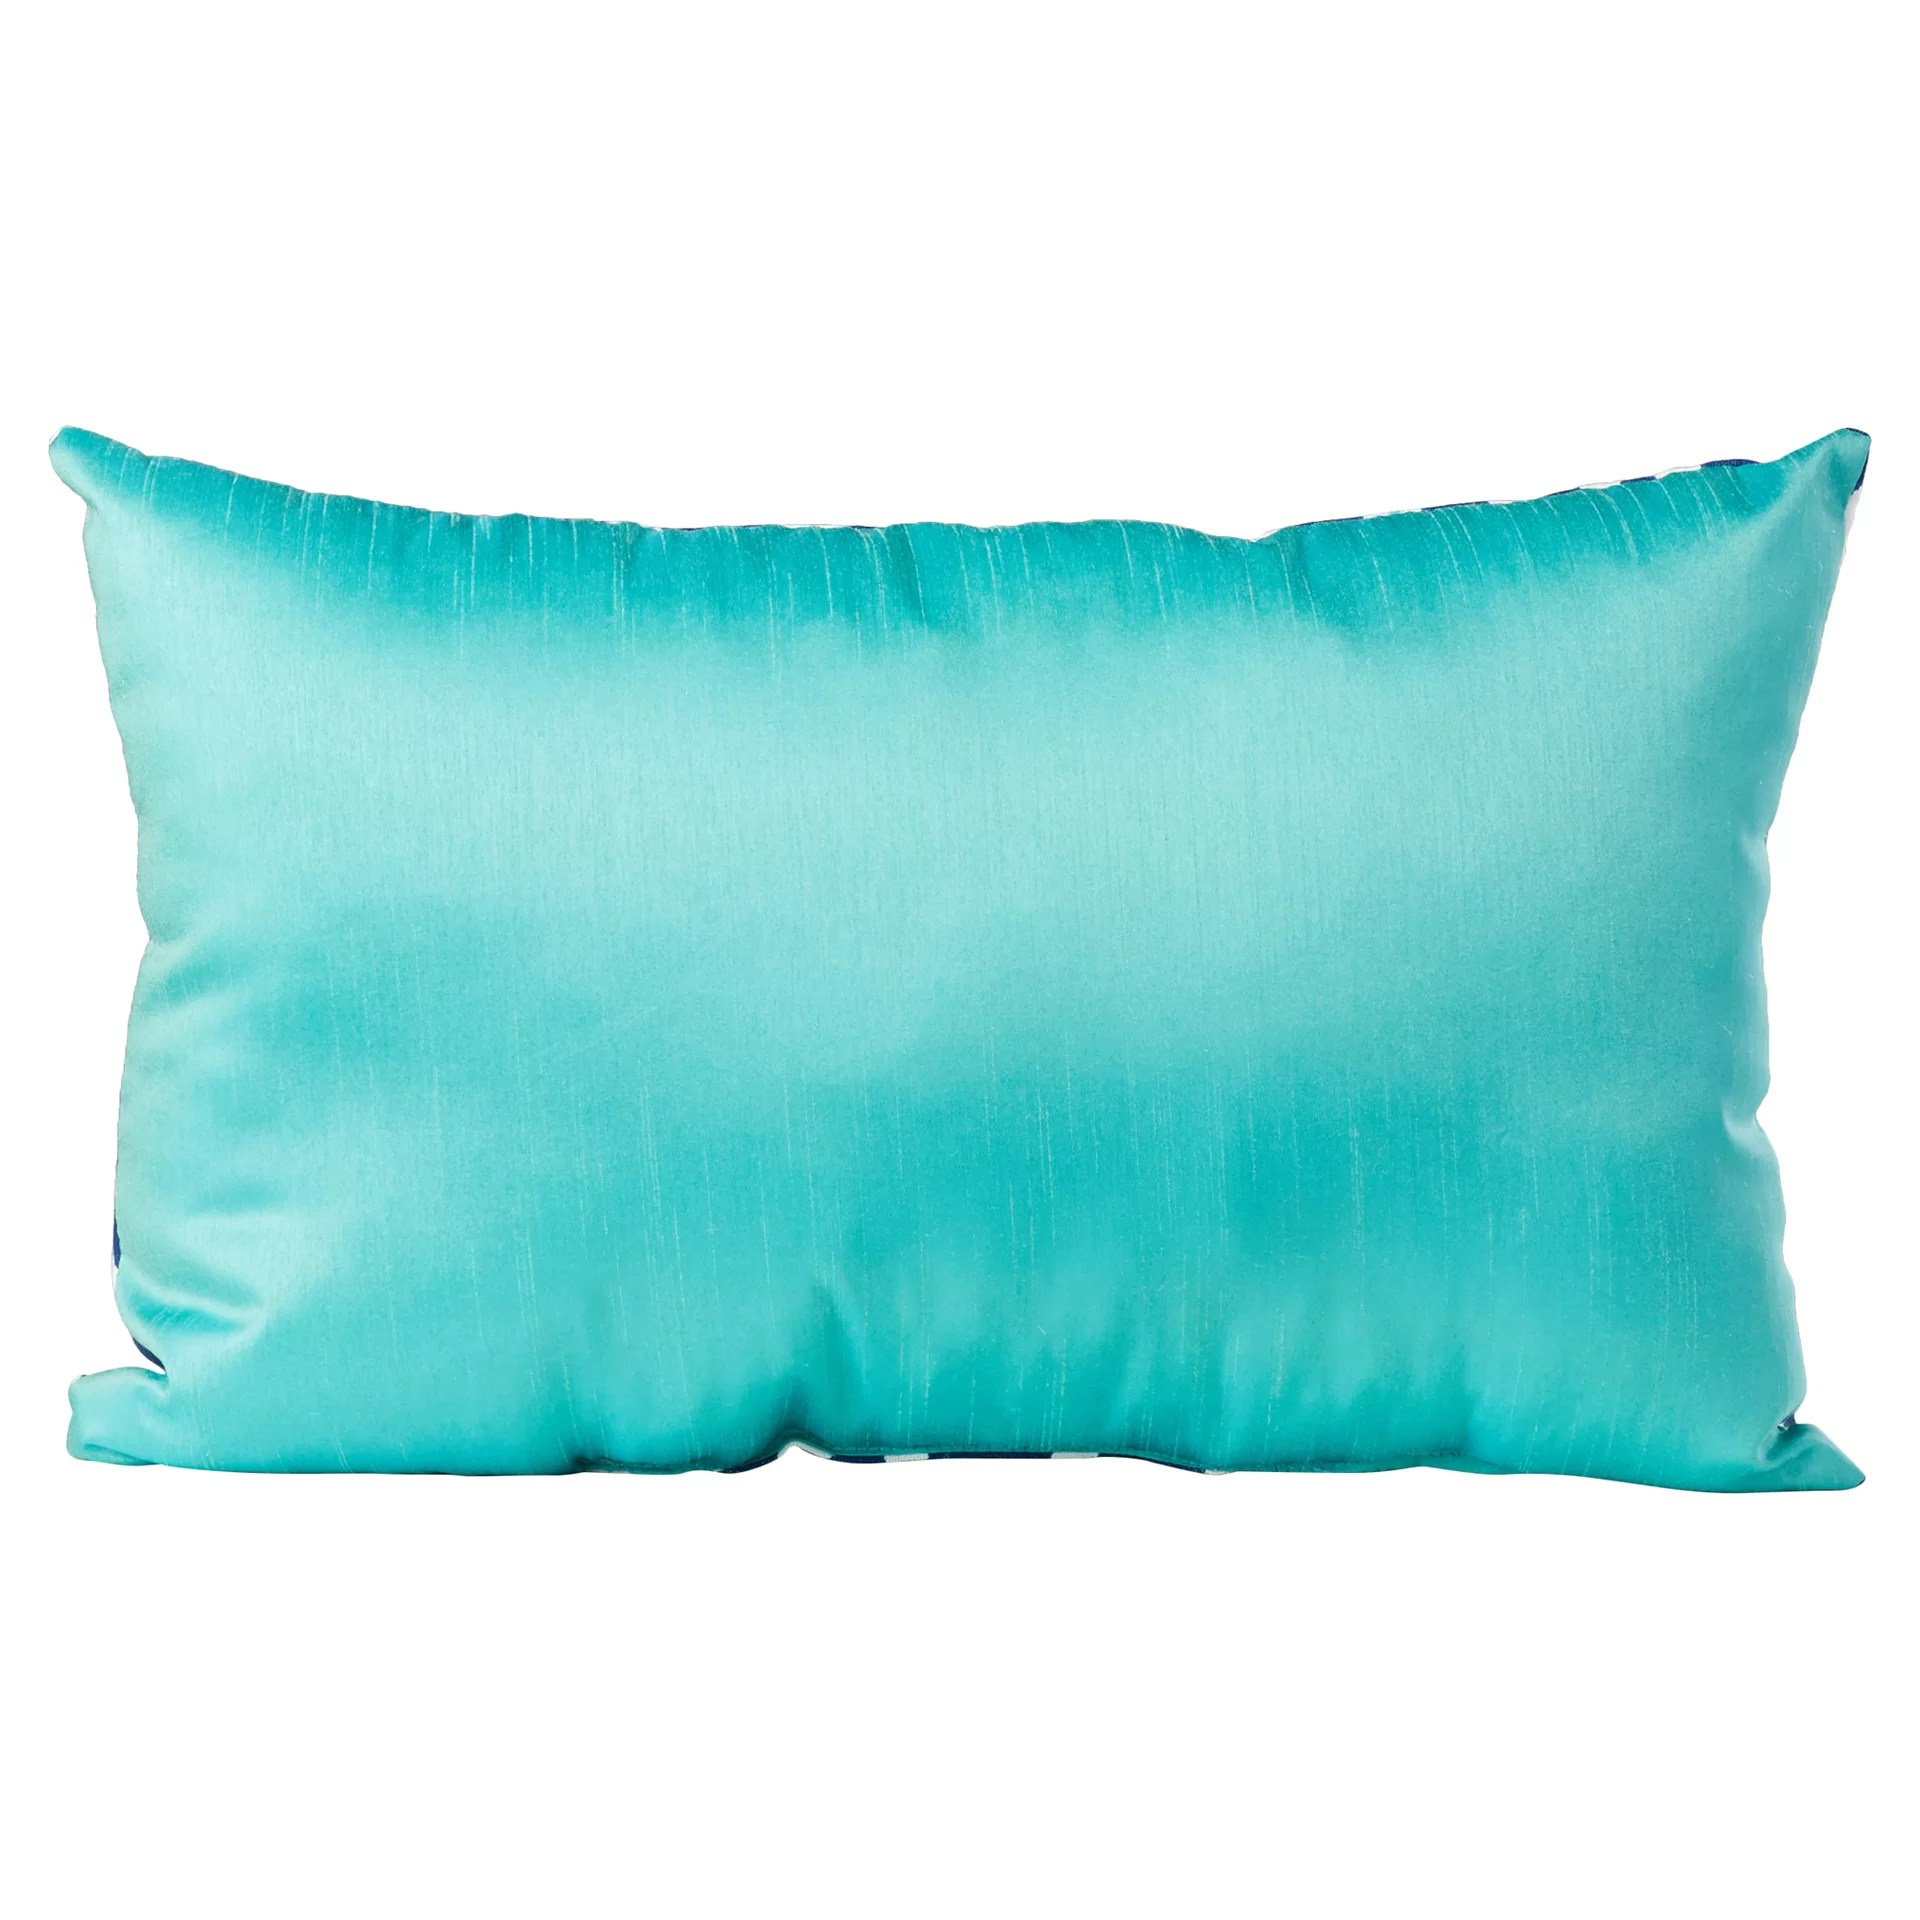 Charlton Home Fraley Lumbar Throw Pillow & Reviews